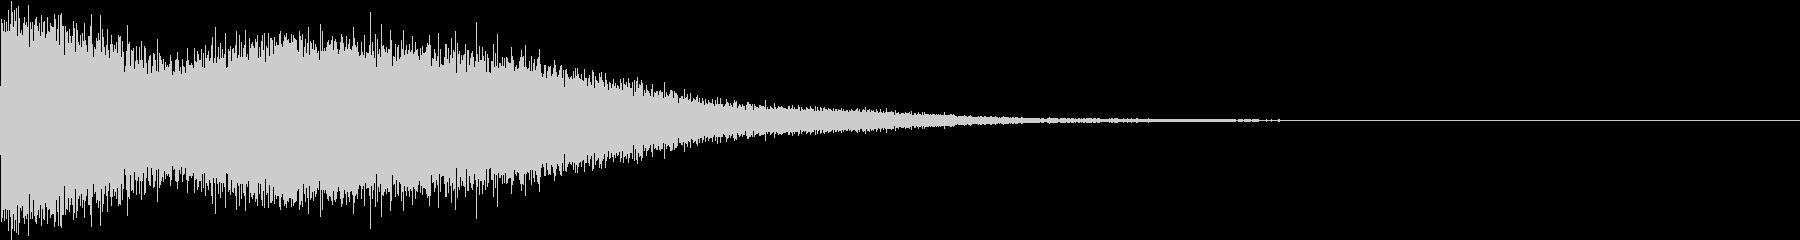 TVFX 目立たせ・アイキャッチ 1の未再生の波形